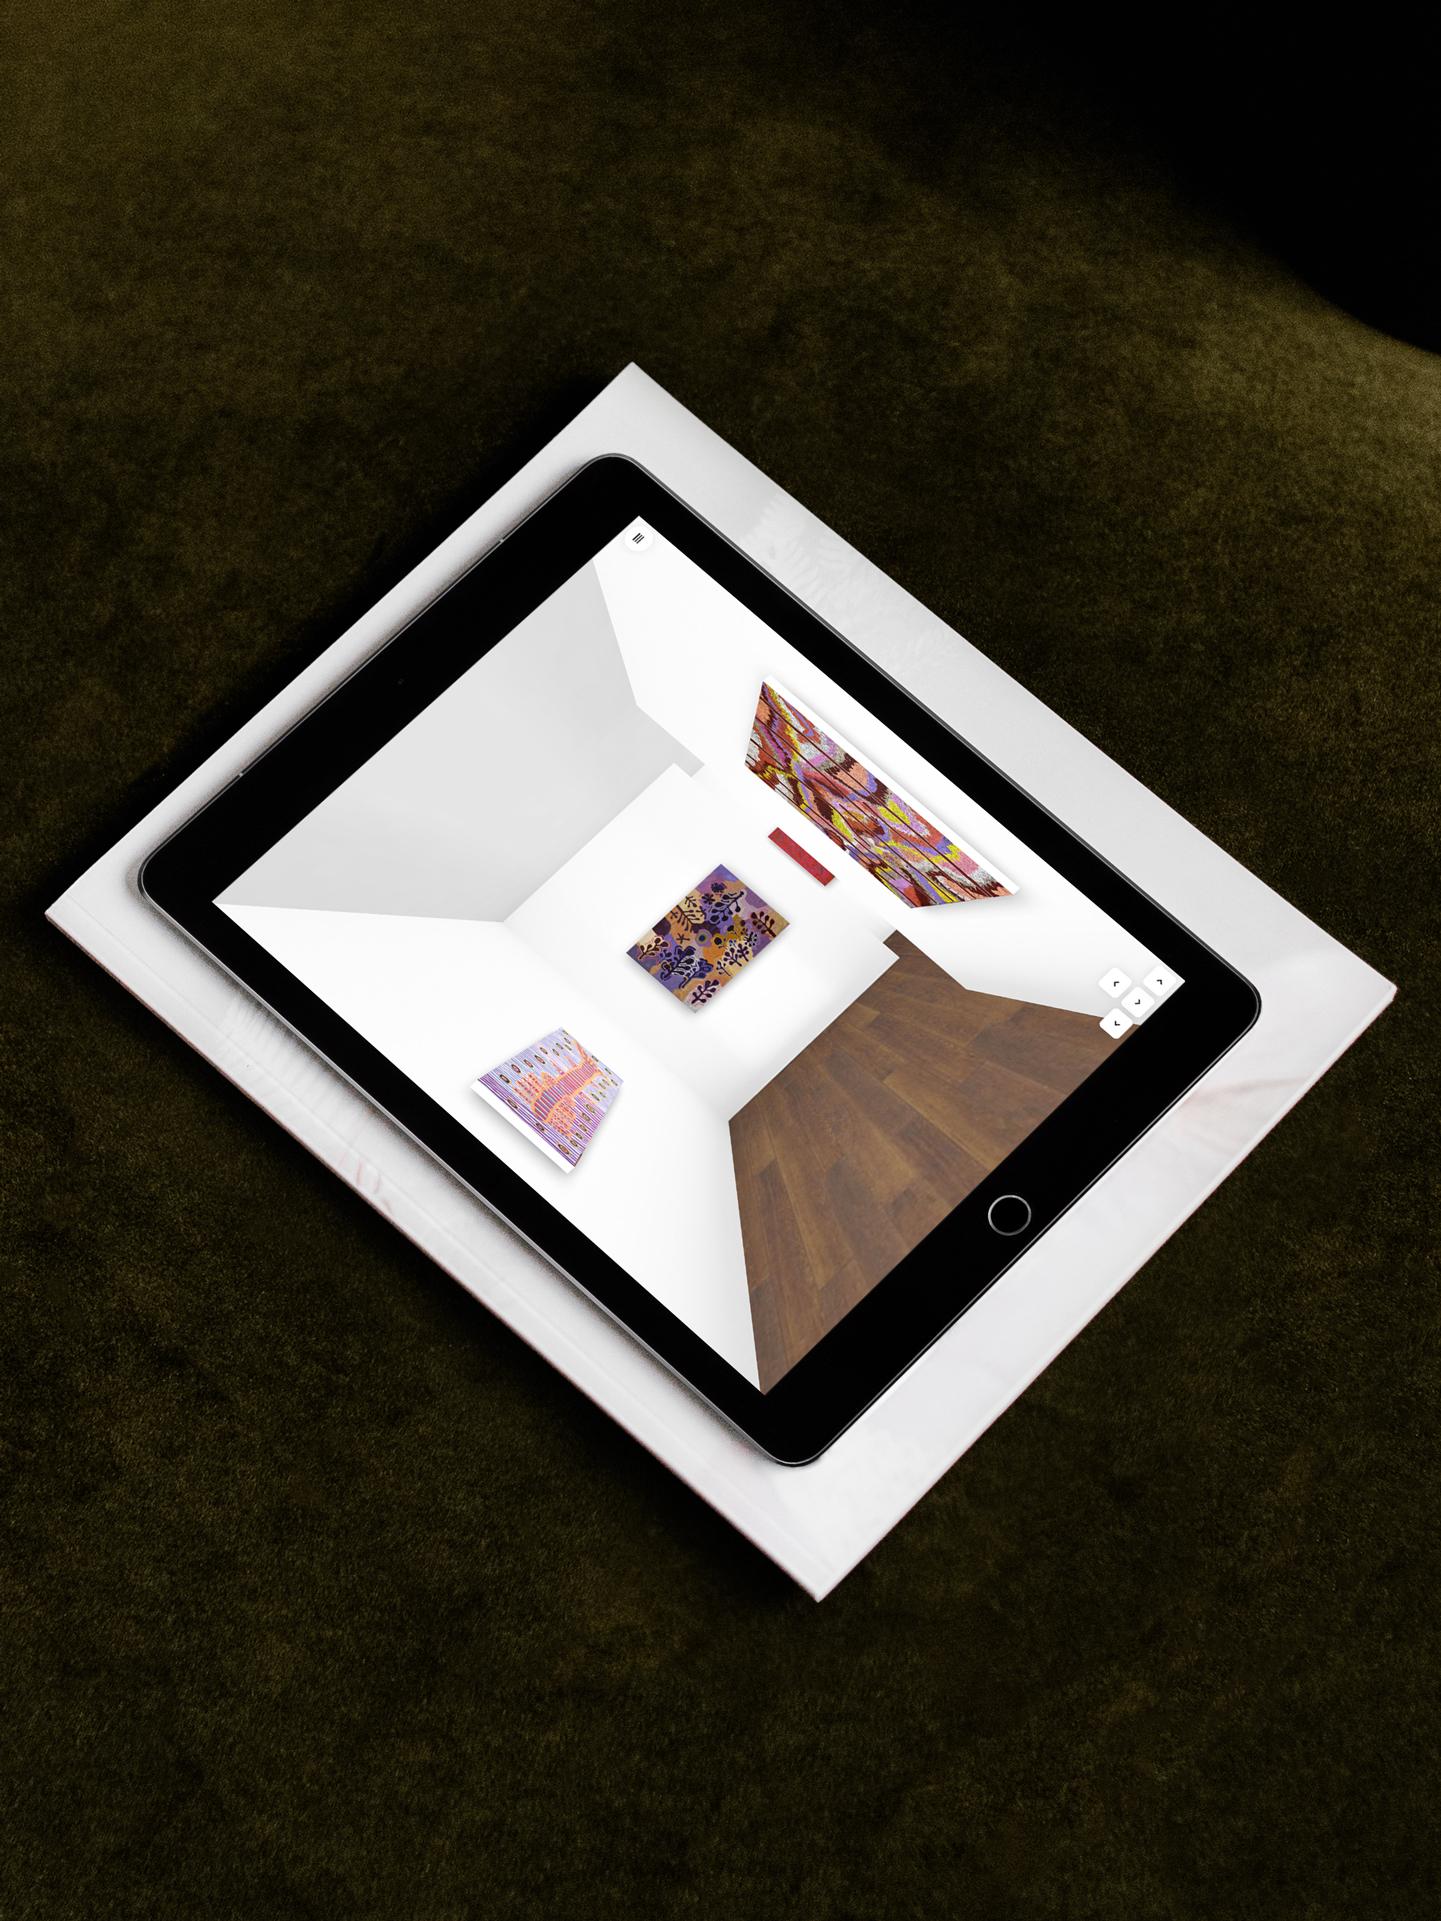 virtual gallery tablet mockup